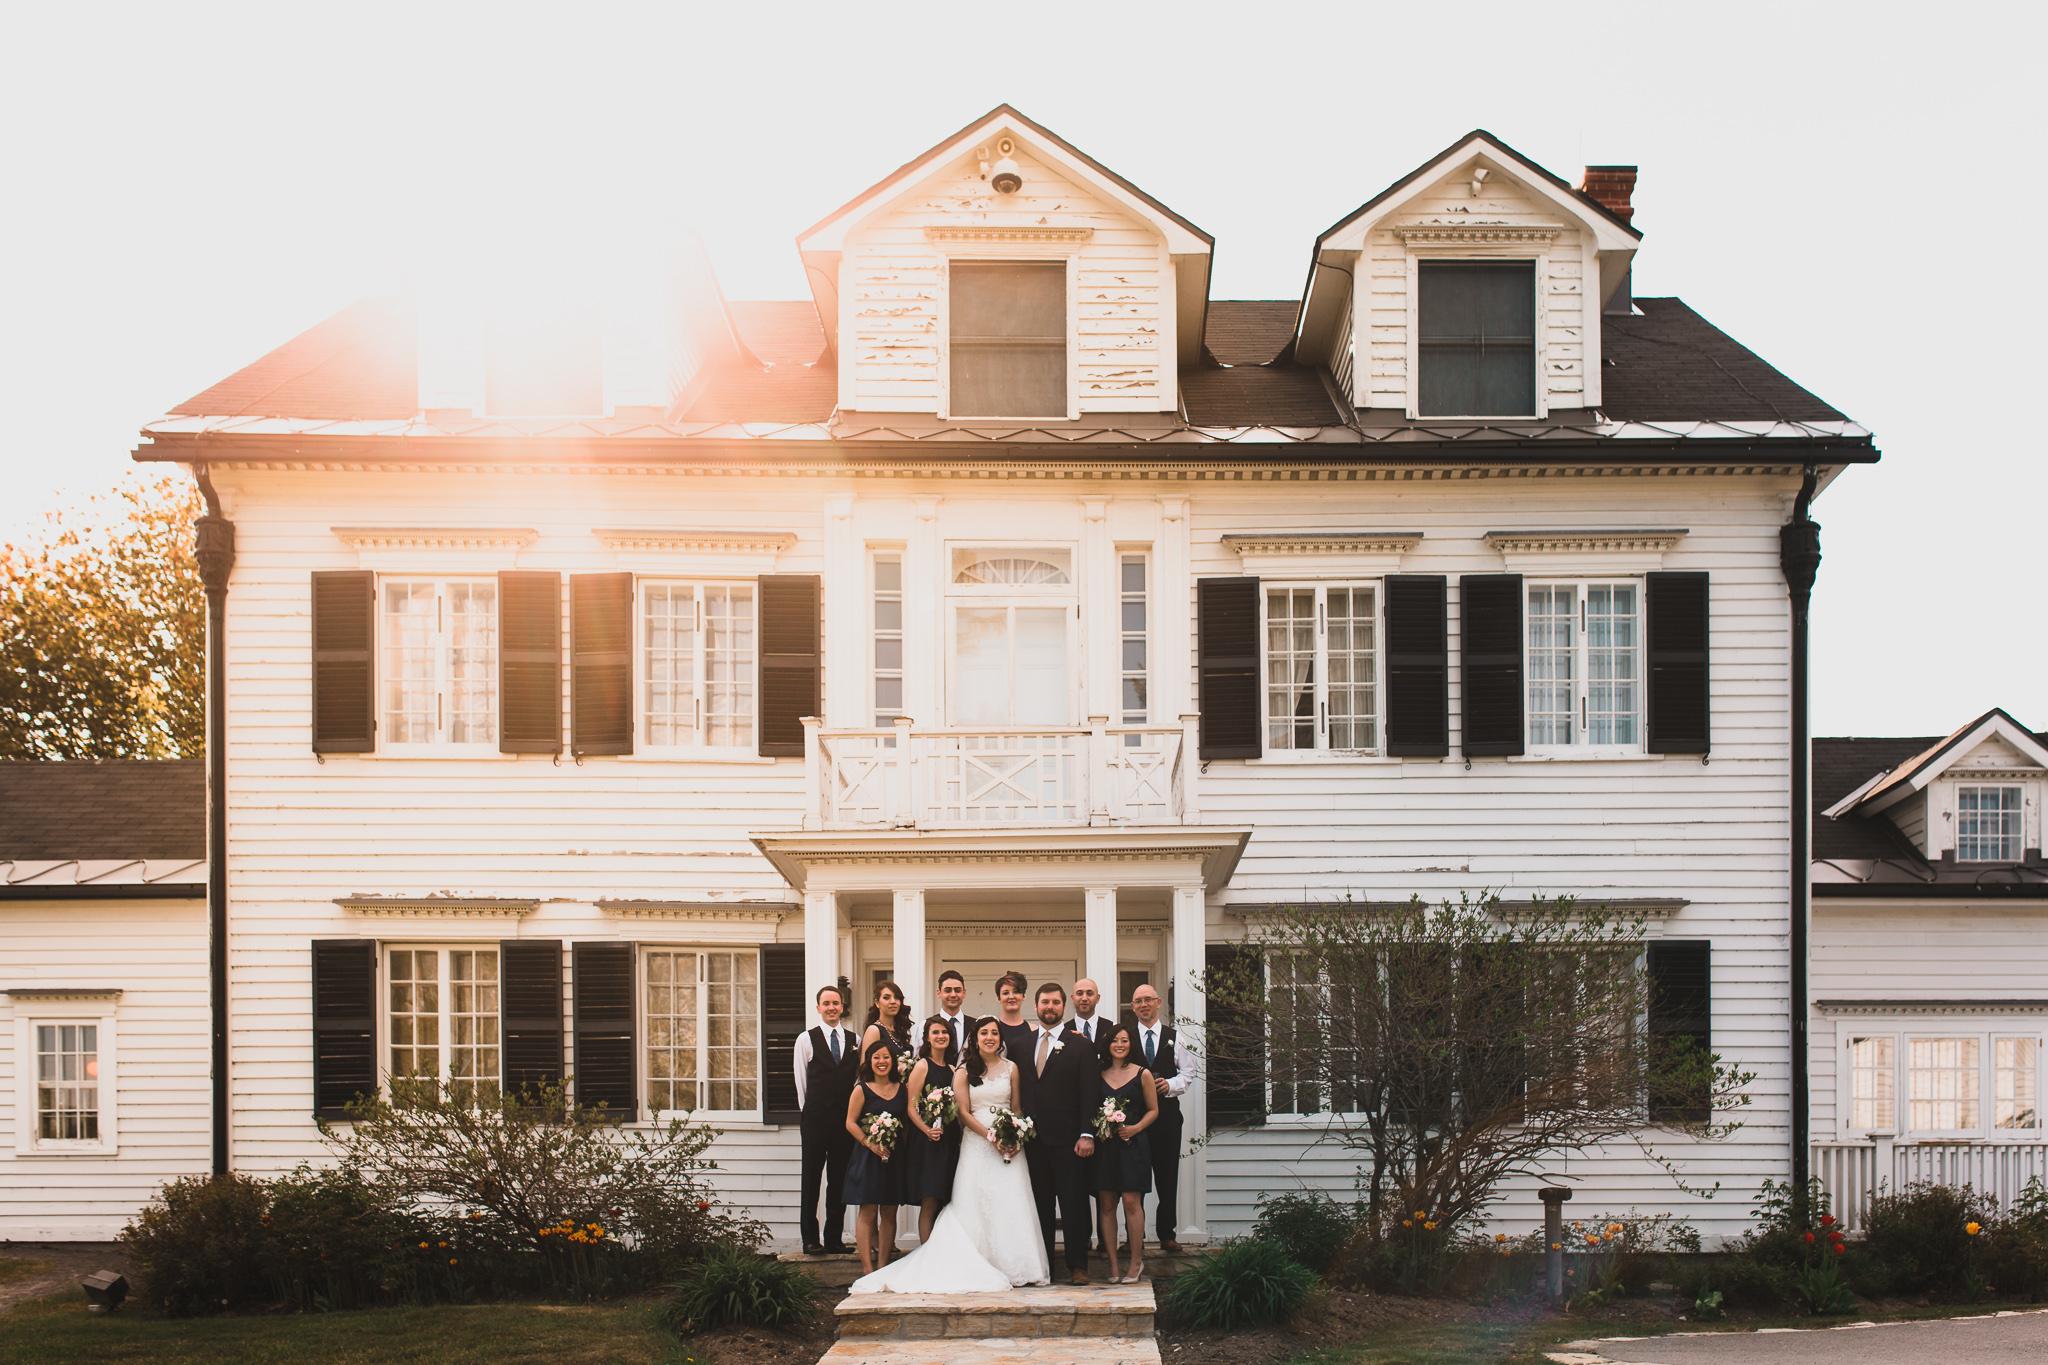 Billings Estate wedding Jonathan kuhn Photography